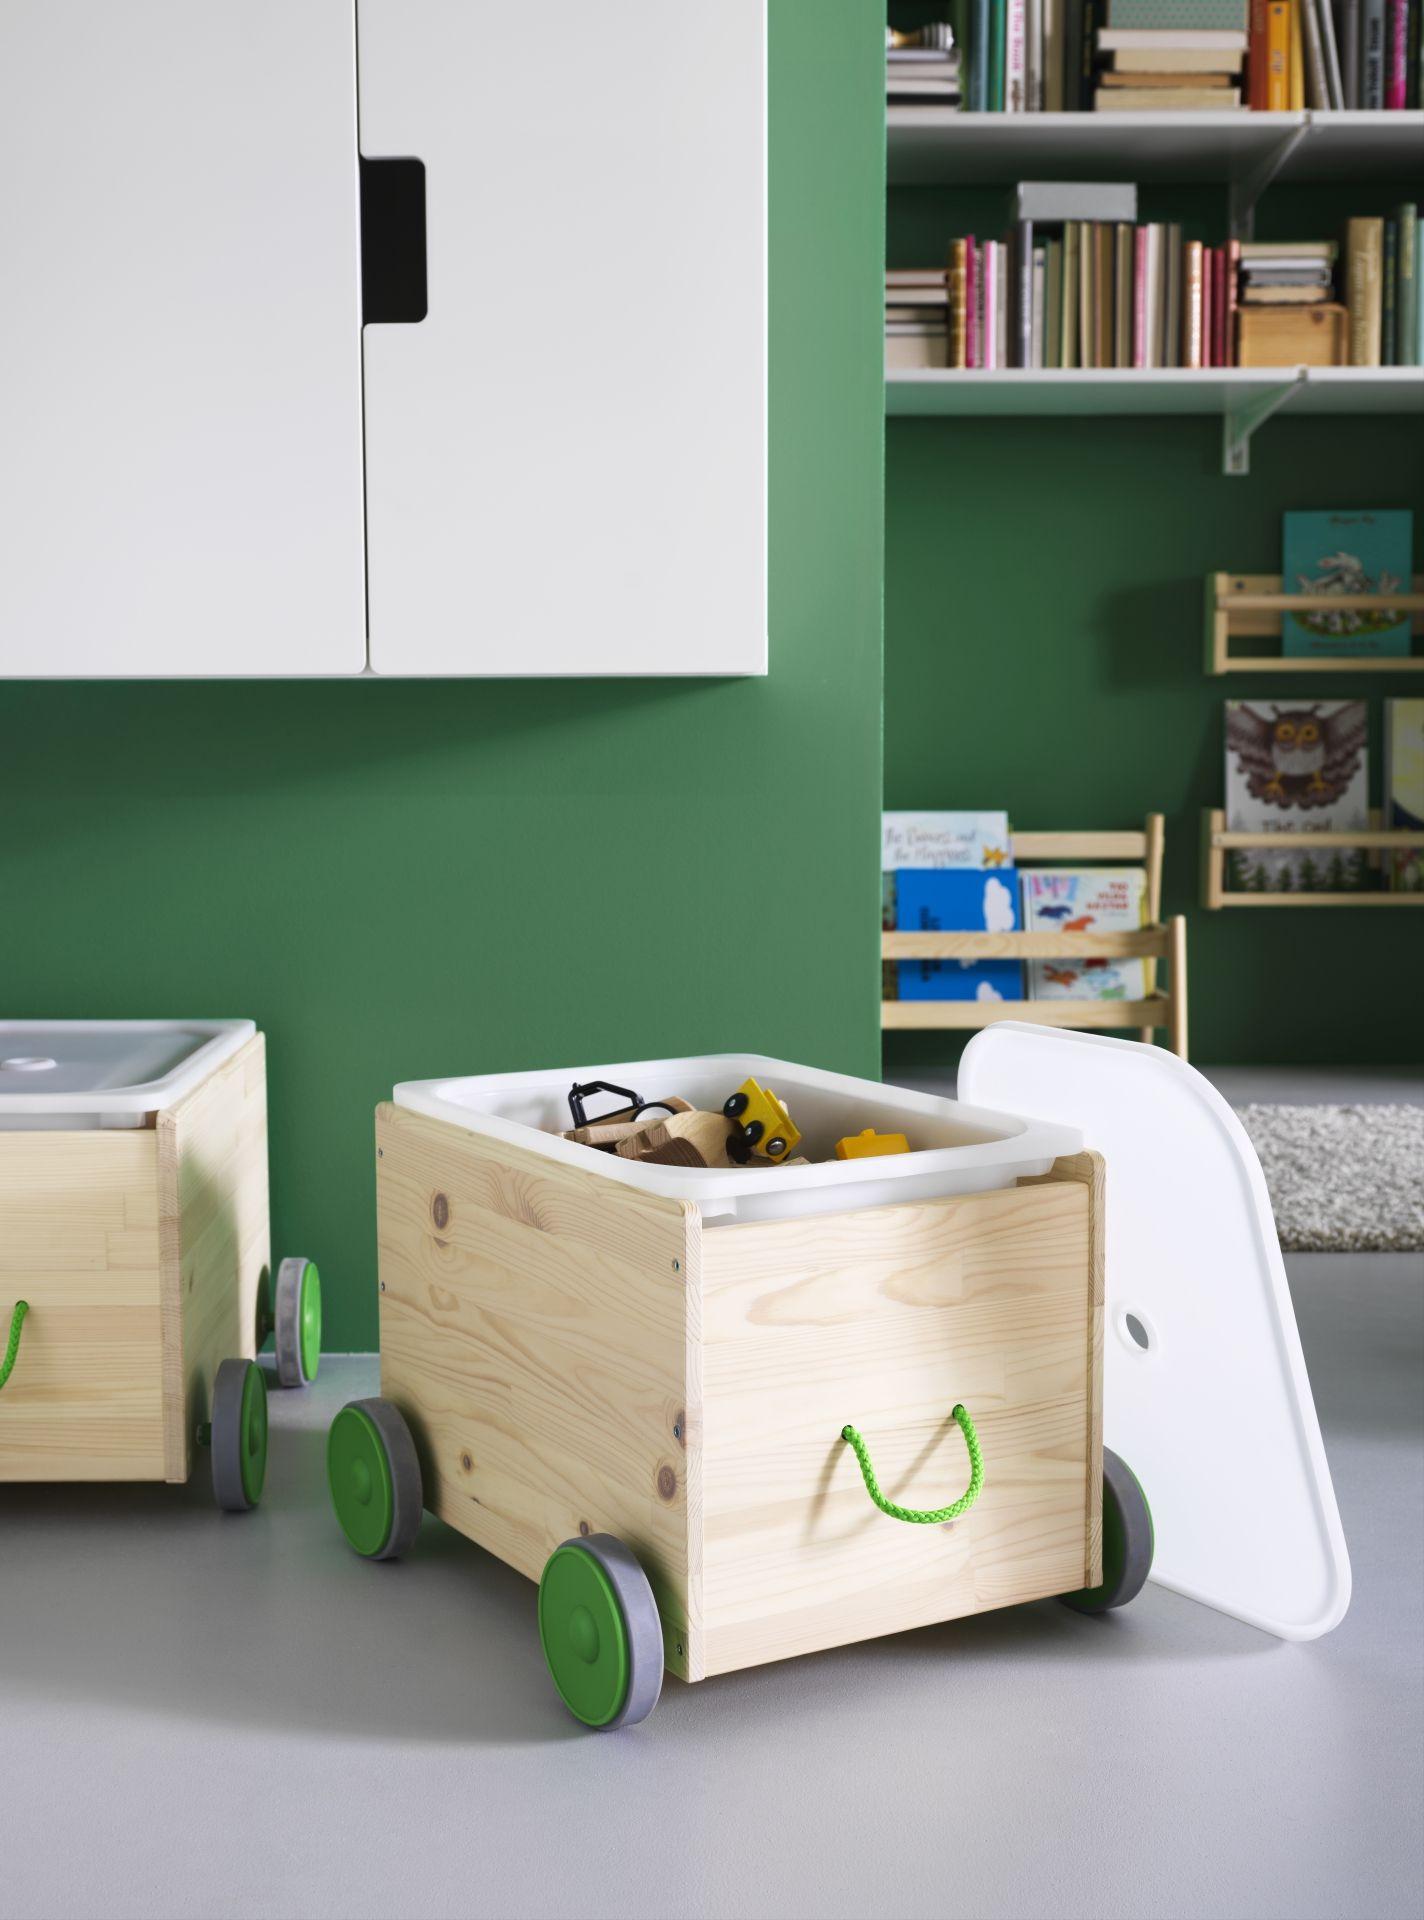 Flisat speelgoedopberger ikeacatalogus nieuw 2017 - Toy storage furniture living room ...